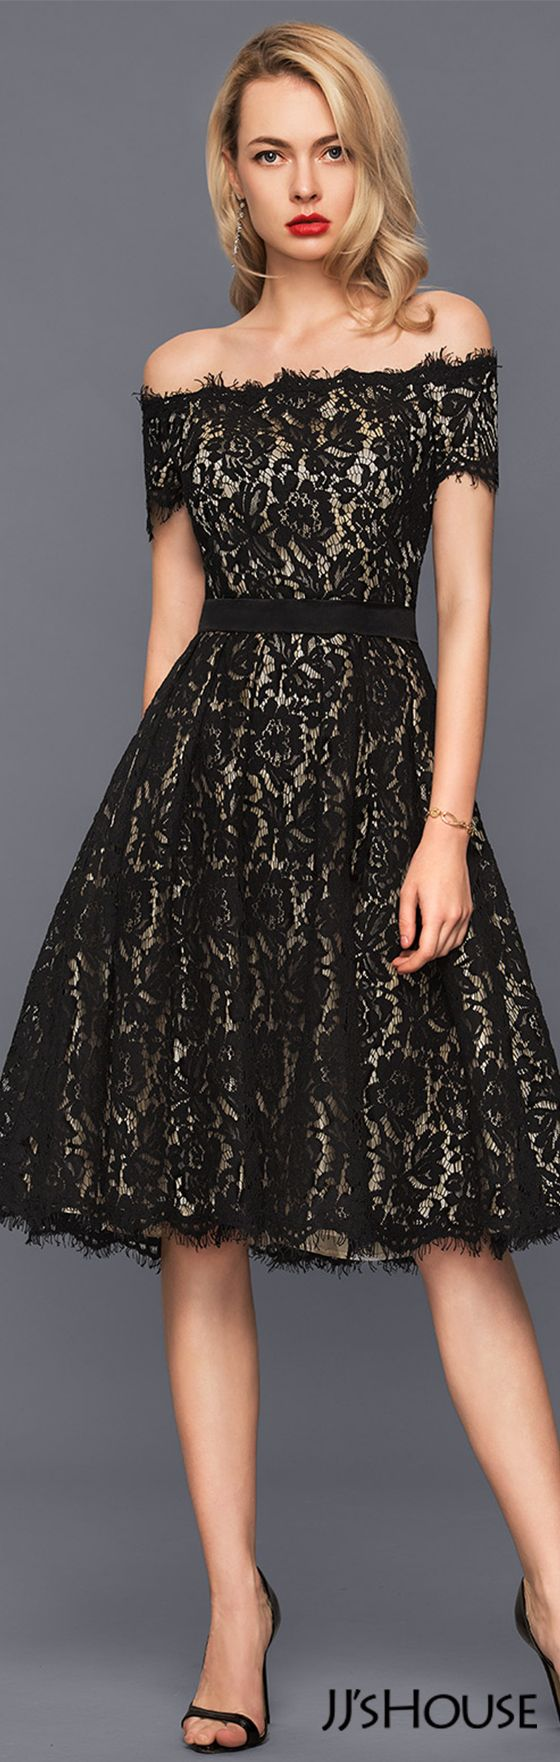 A-Line/Princess Off-the-Shoulder Knee-Length Lace Cocktail Dress#JJsHouse #Cocktail dresses